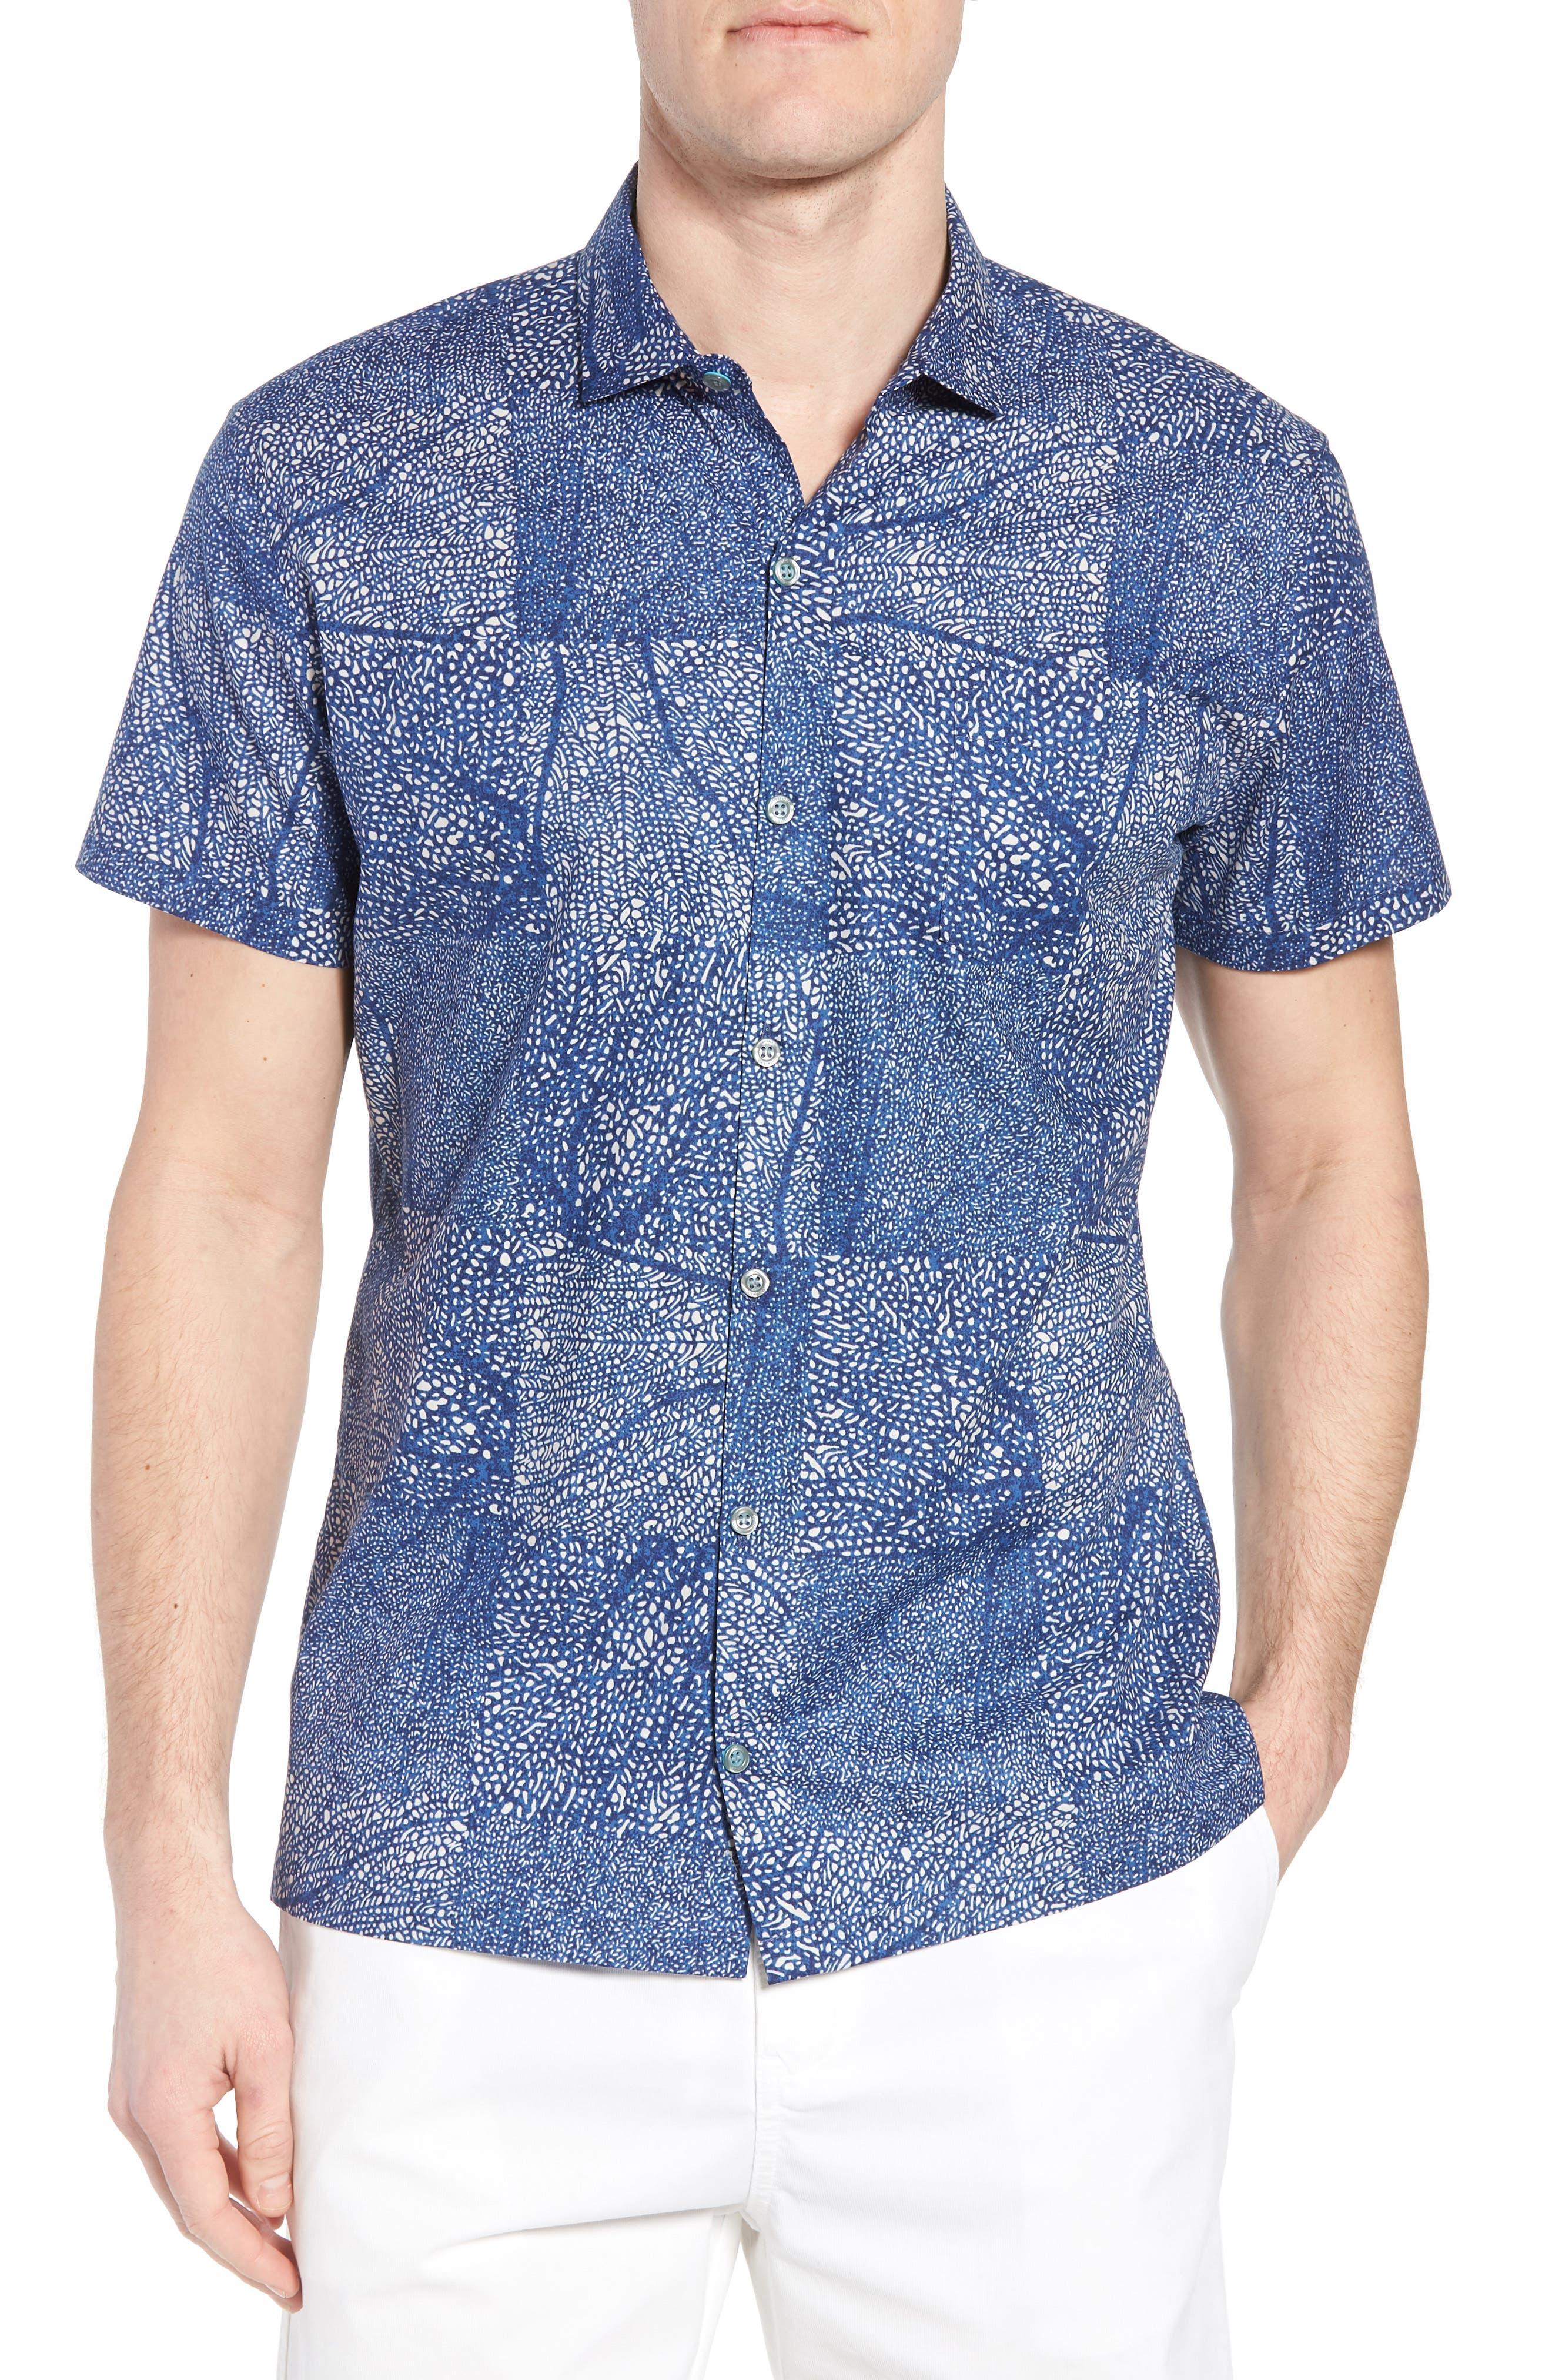 Black Coral Trim Fit Camp Shirt,                             Main thumbnail 1, color,                             Navy